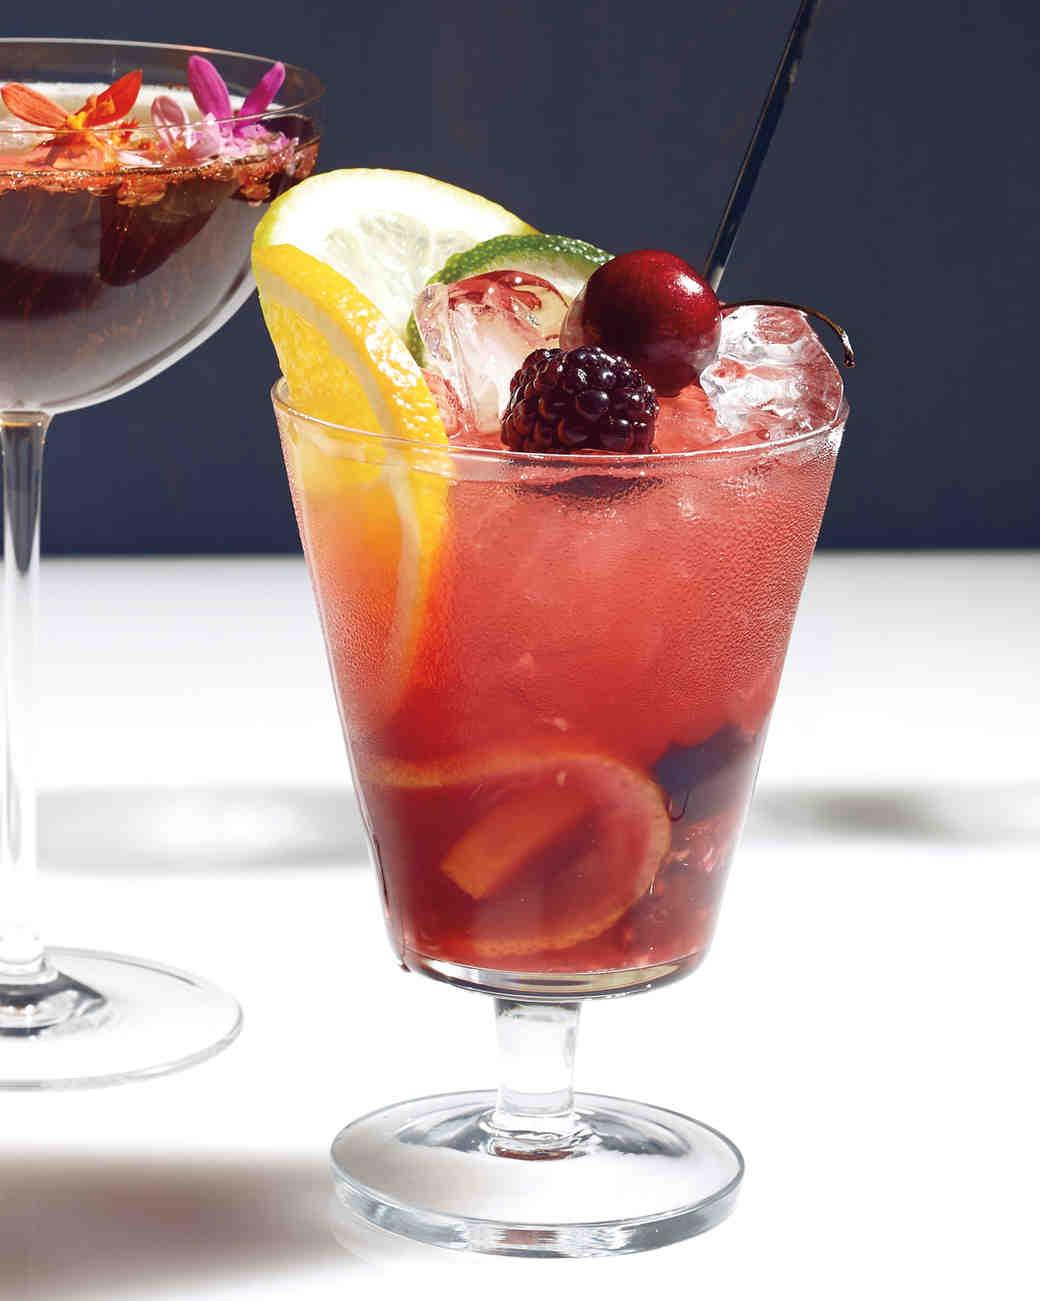 sherry-quina-cocktail-recipe-wedding-f15-d112228-0915.jpg